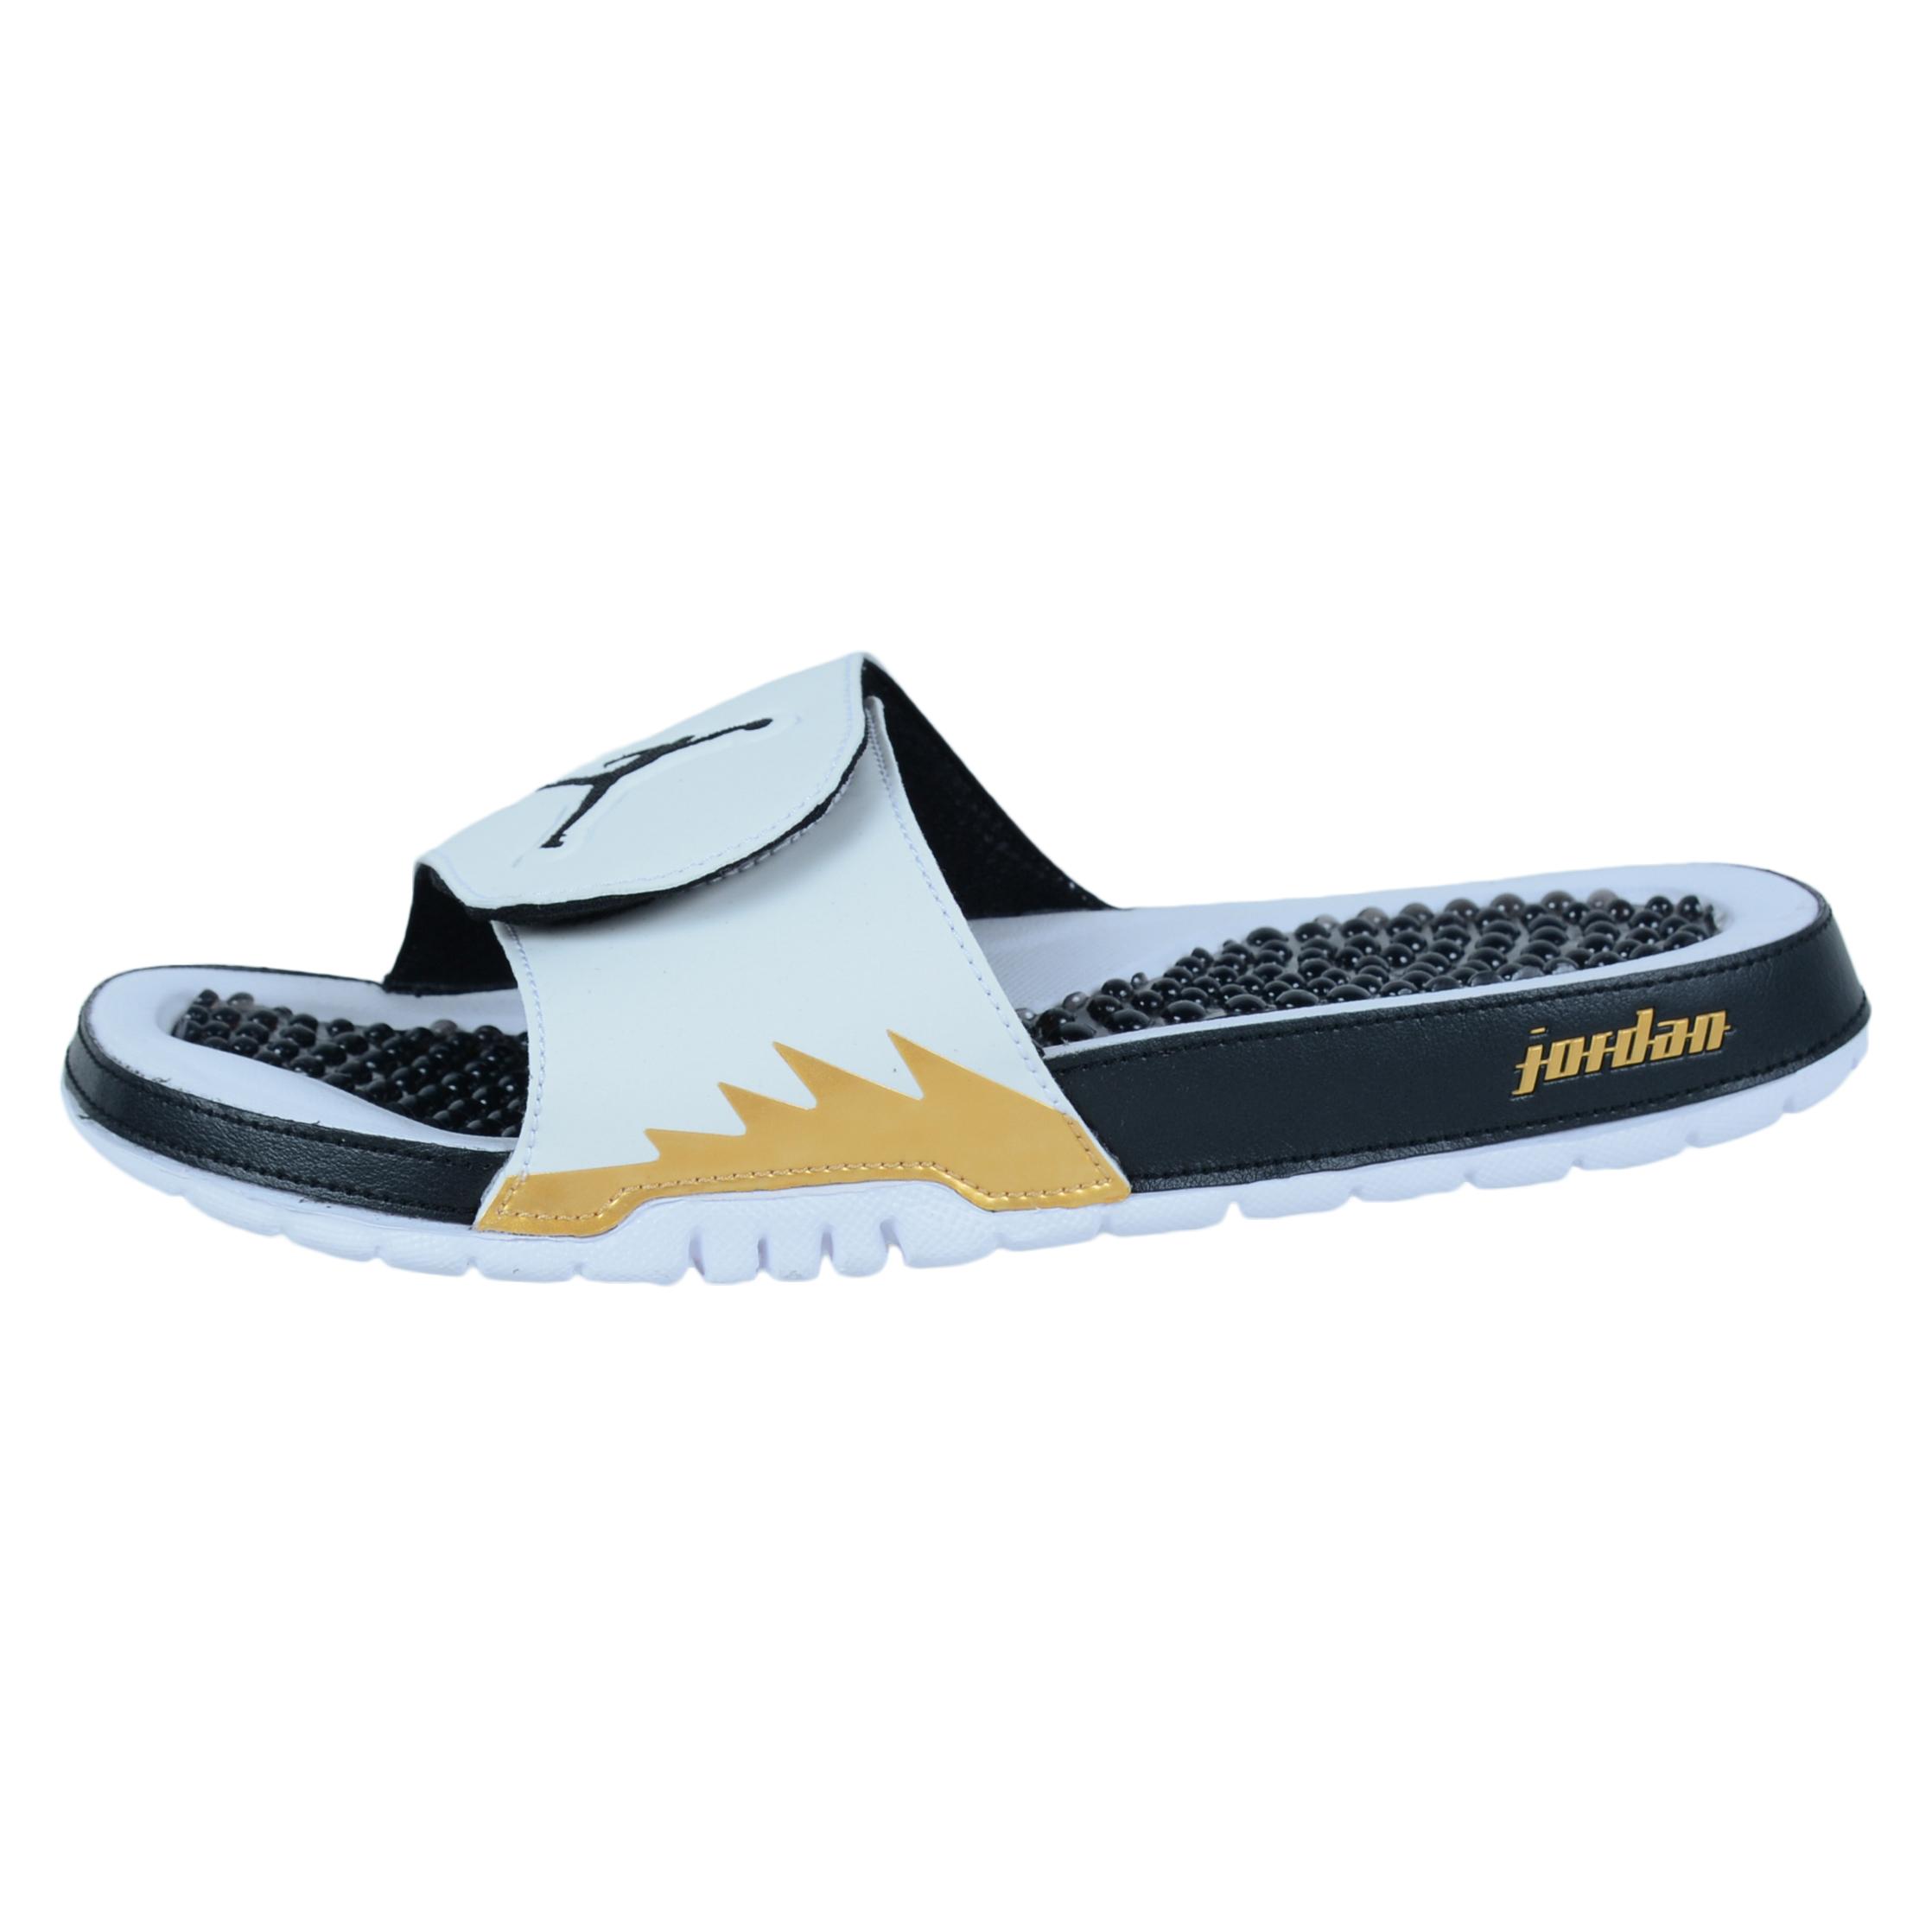 Black jordan sandals - Nike Jordan Hydro V Retro Slide Sandals White Black Metallic Gold 555501 153